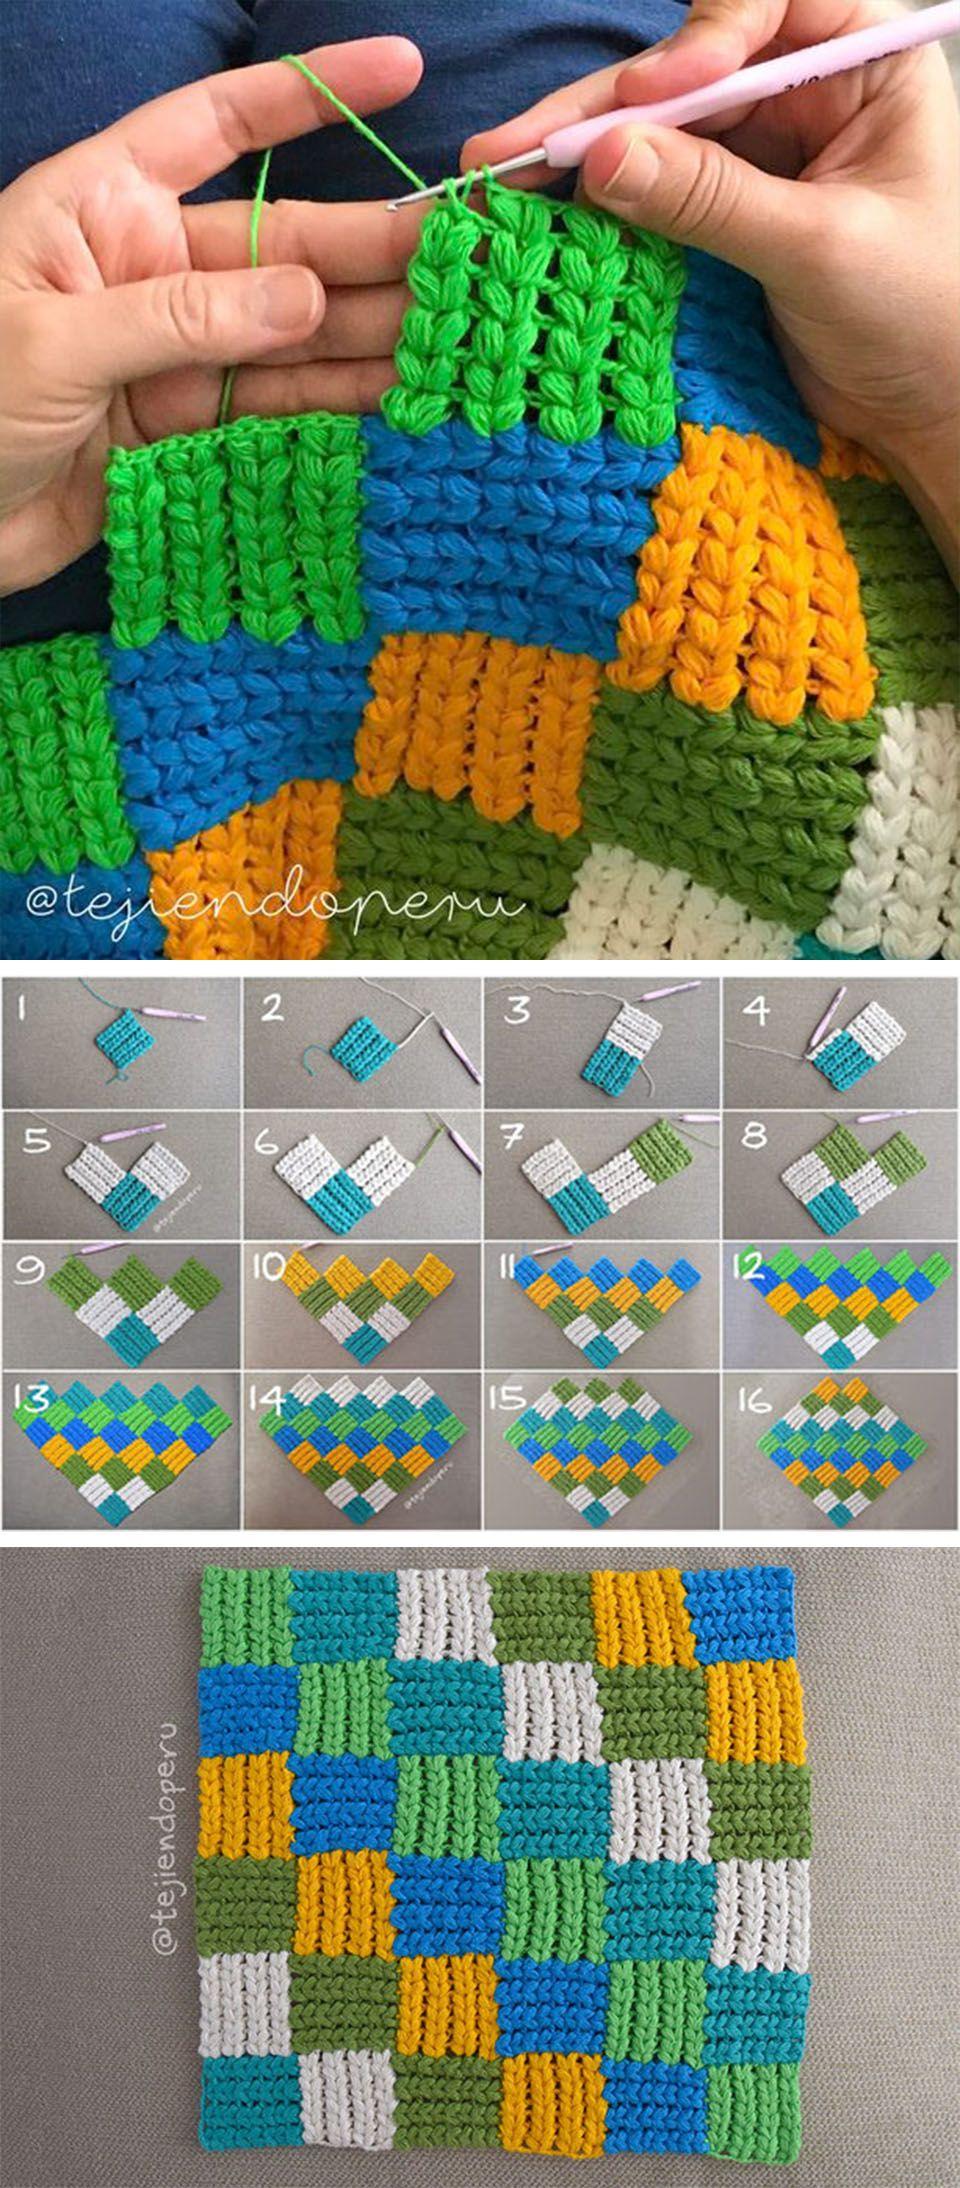 Interlaced Braid Stitch Crochet Pattern   Pinterest ...